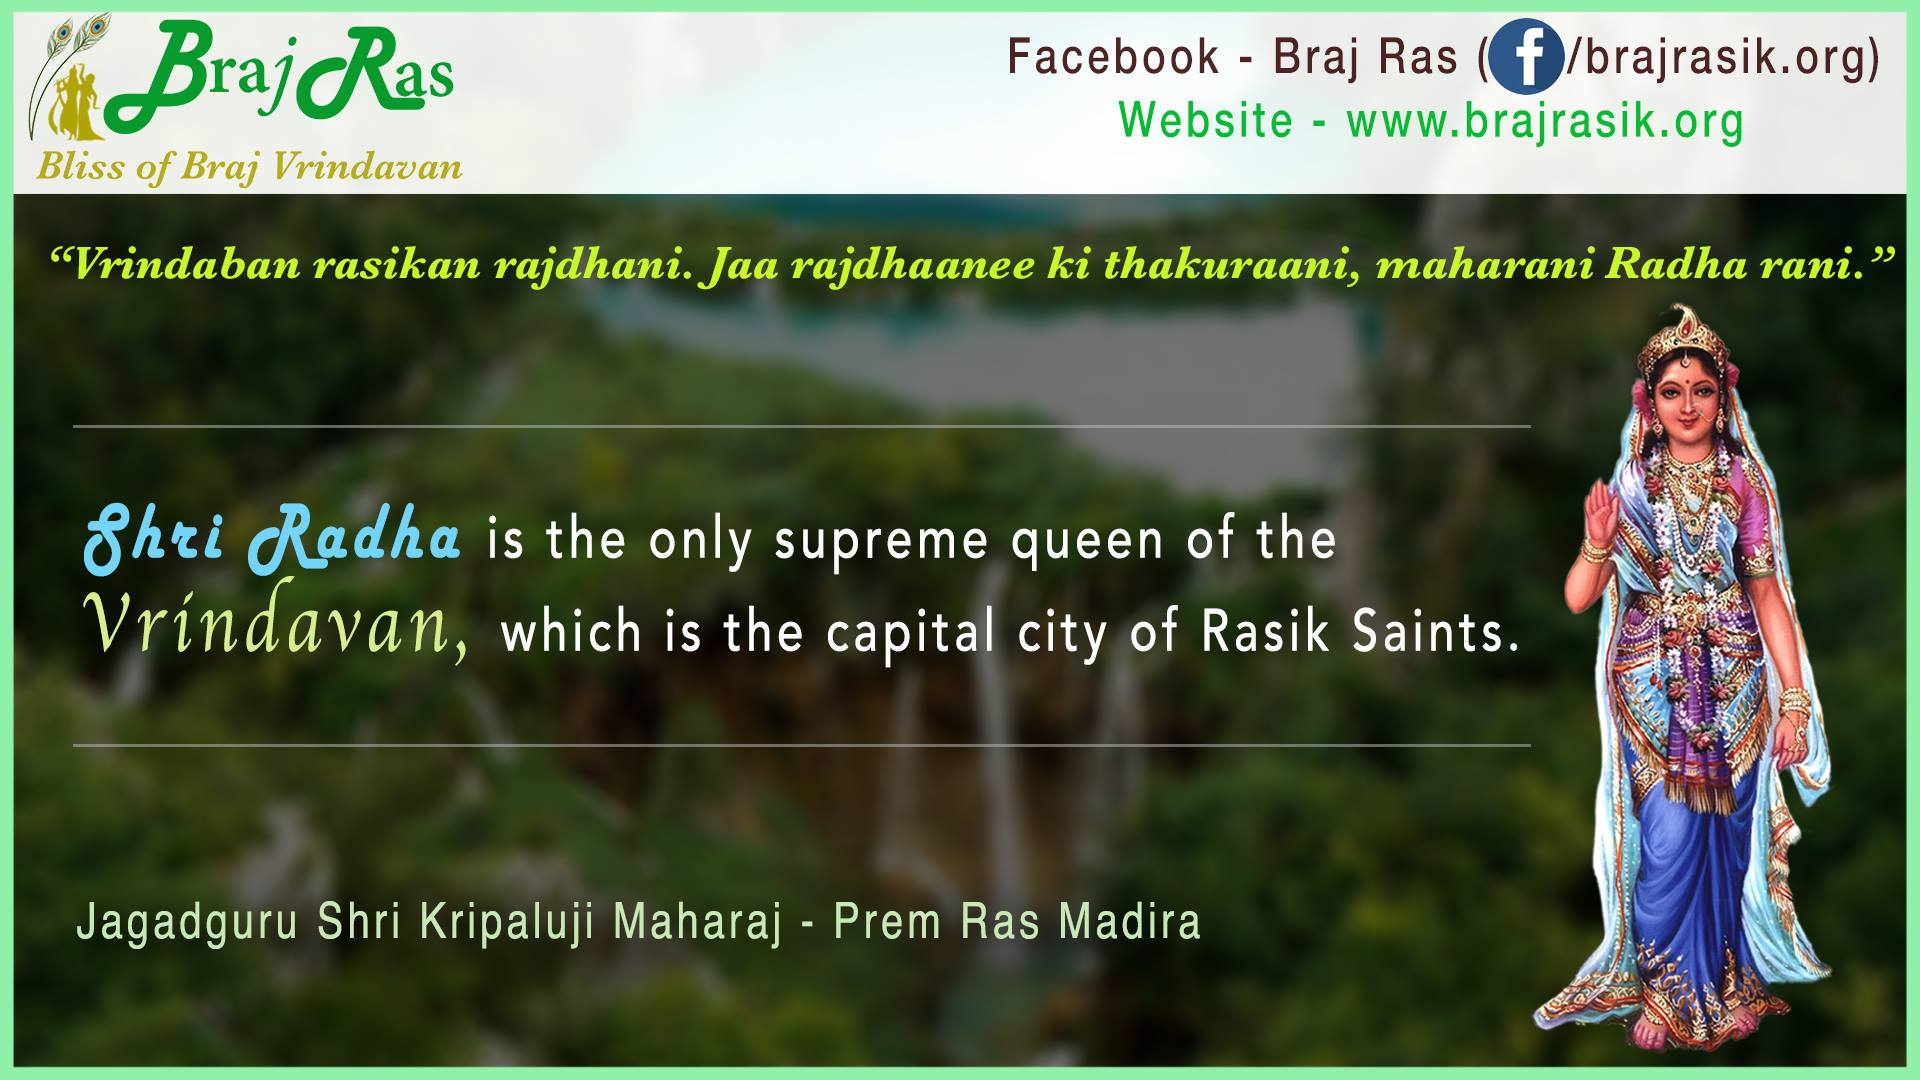 Vrindaban rasikan rajdhani - Jagadguru Shri Kripaluji Maharaj - Prem Ras Madira